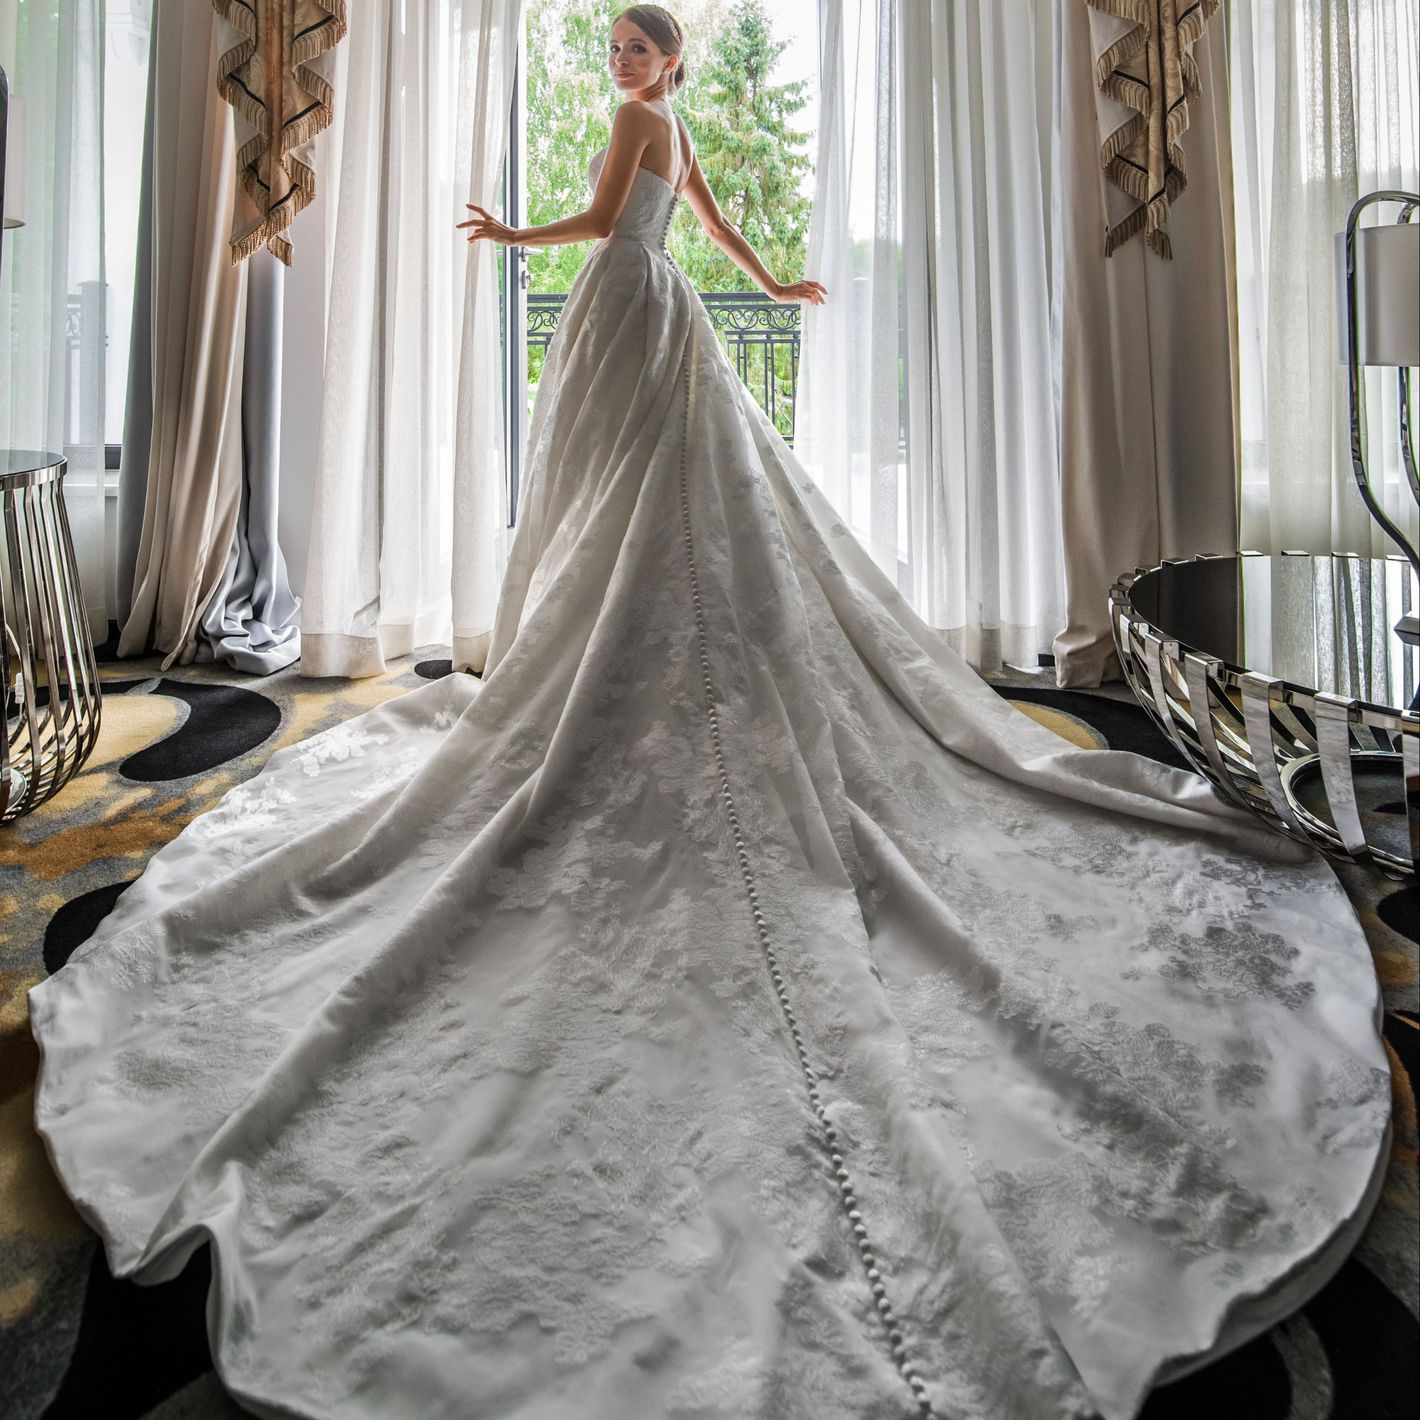 - Style 9858: Robe de bal en organza recouverte d'appliqués en dentelle avec traîne royale